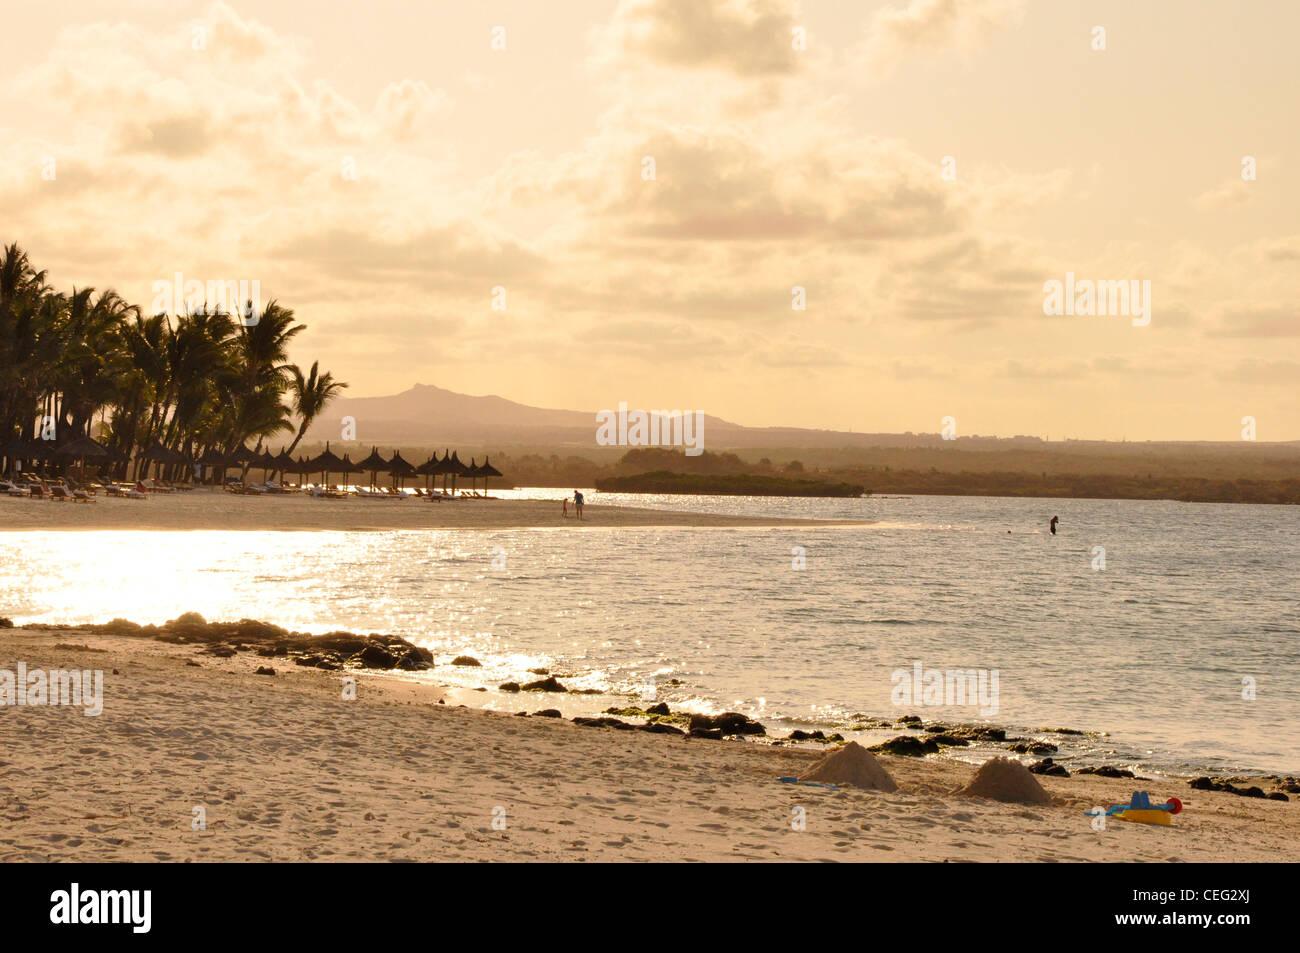 Monochromatic seascape sub tropical palms - Stock Image